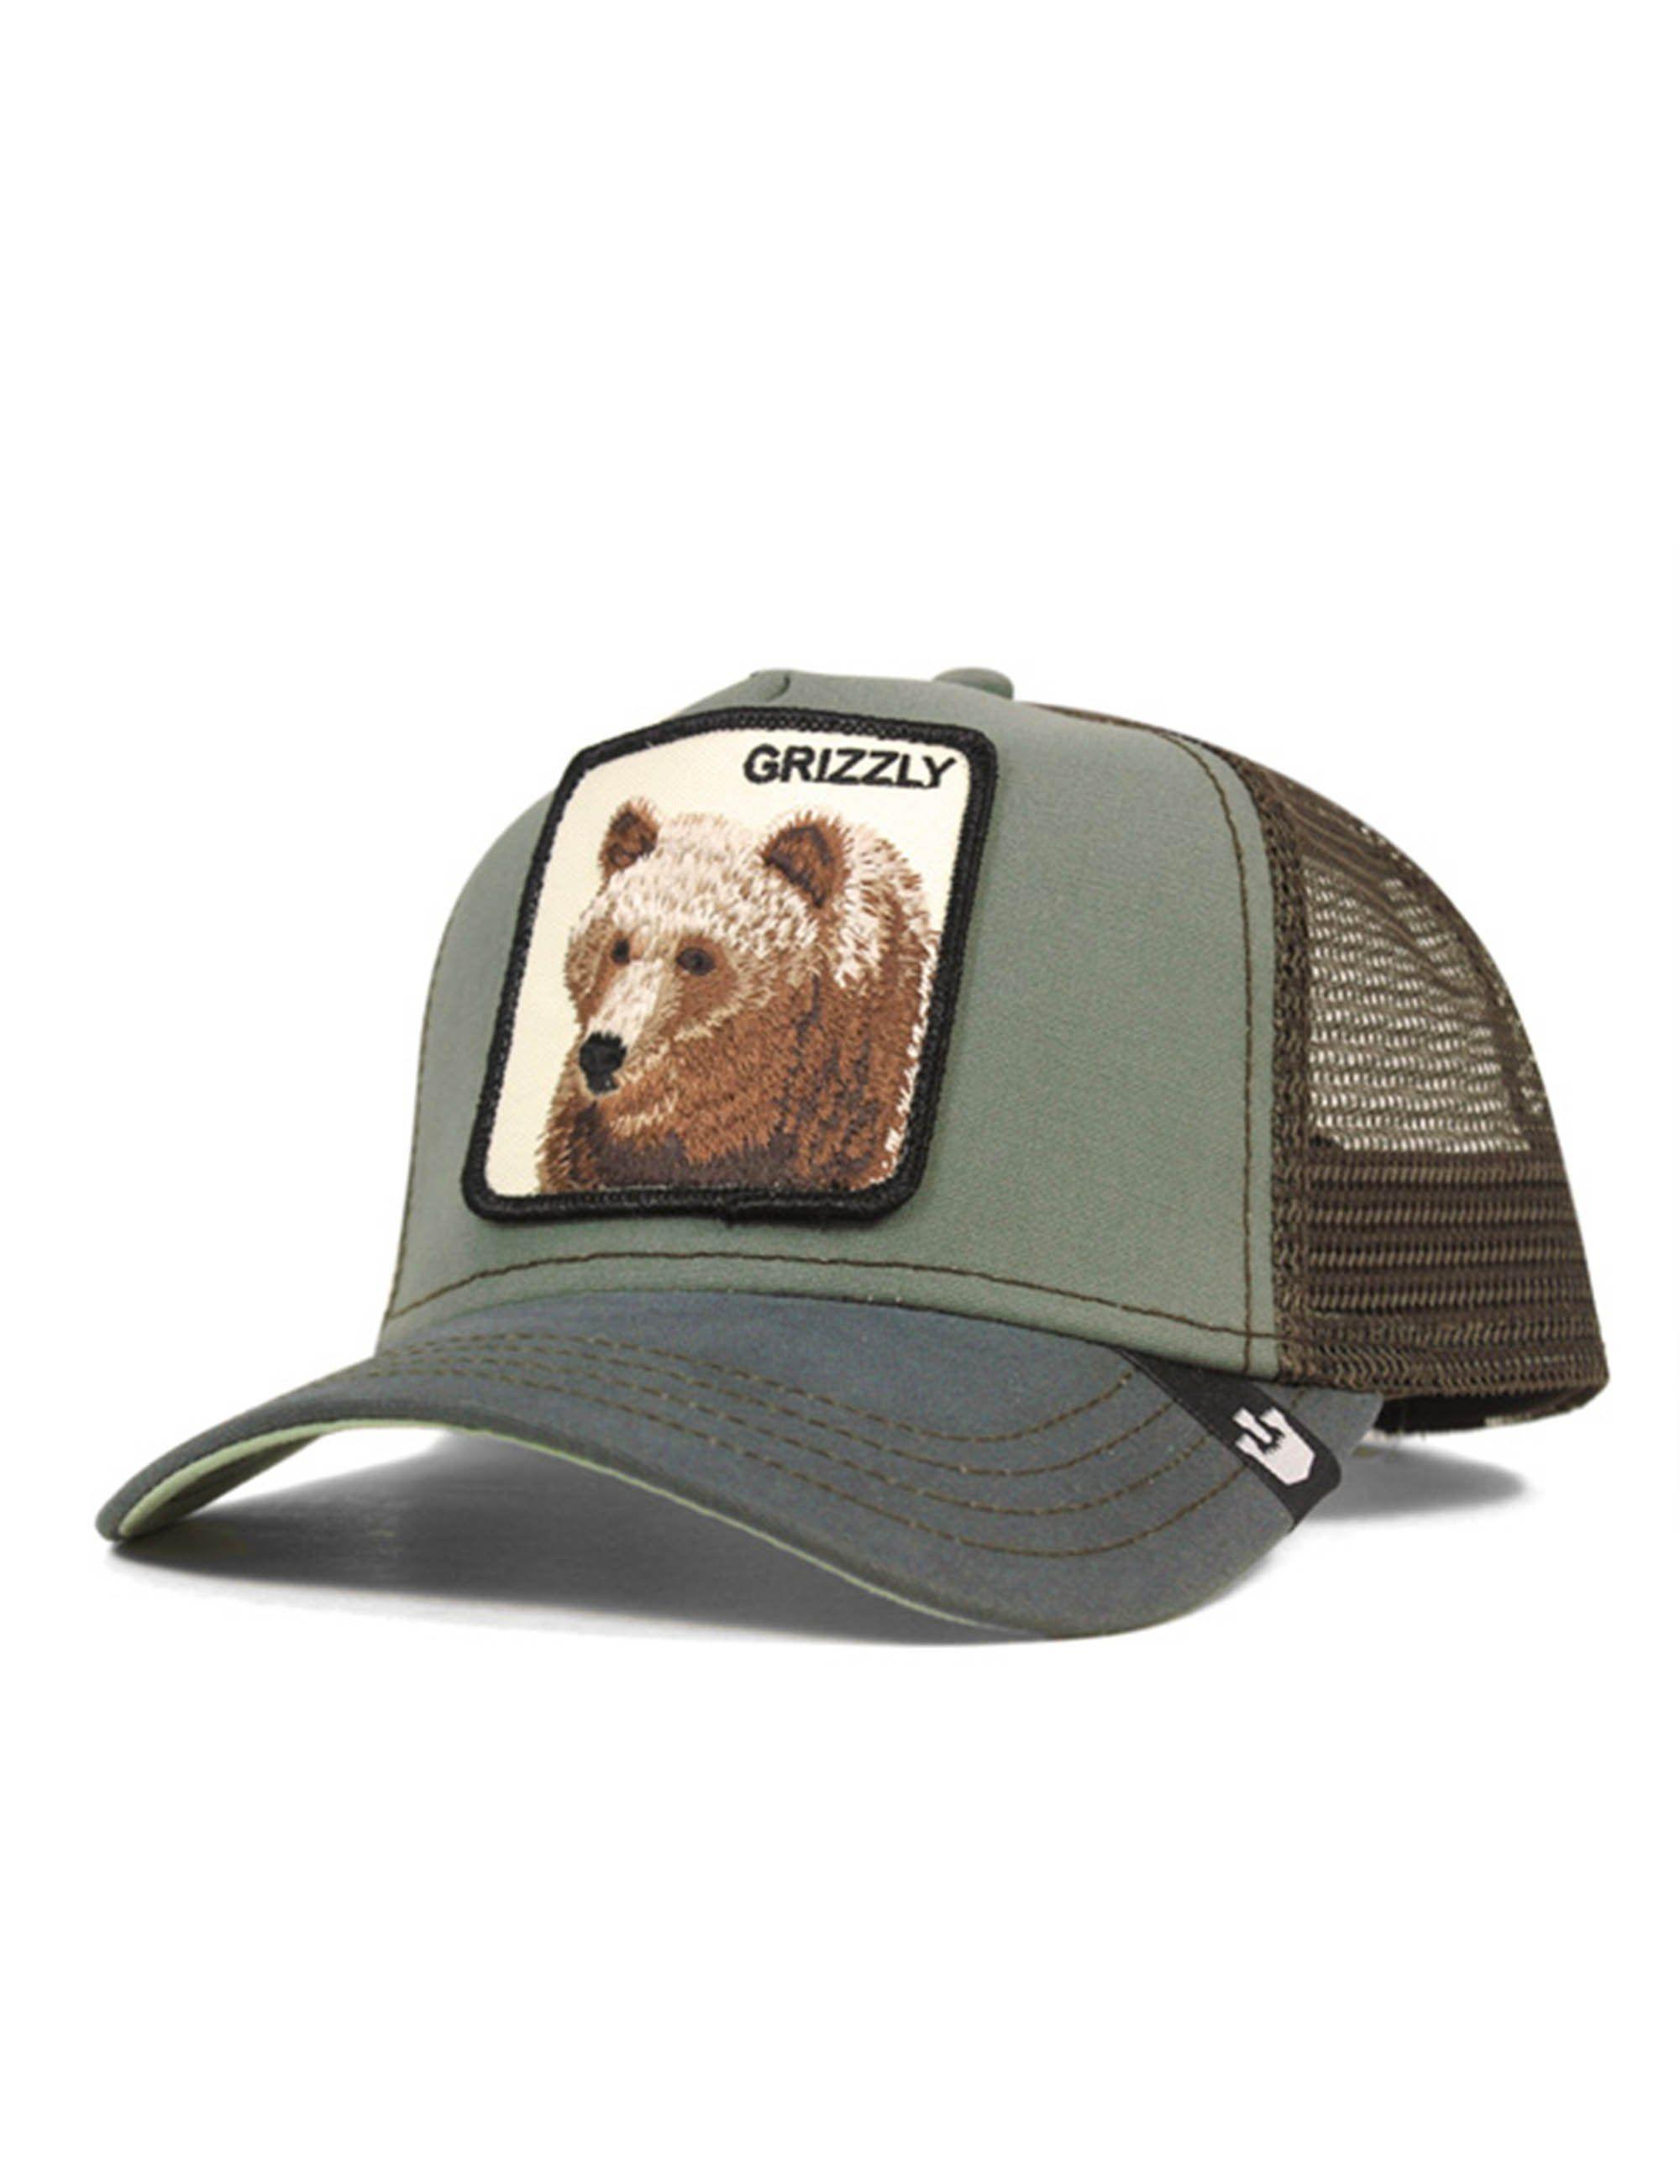 c703dec5 Goorin Bros Animal Farm Trucker Cap Grizz | Products | Cap, Baseball ...